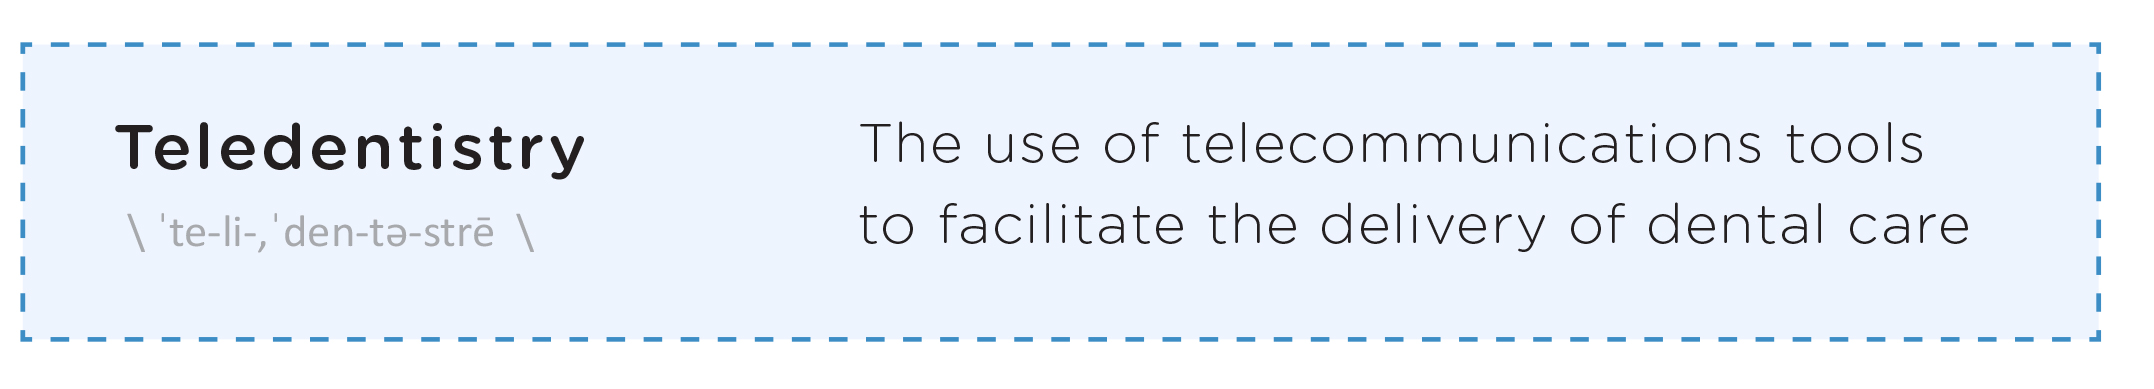 Definition Teledentistry